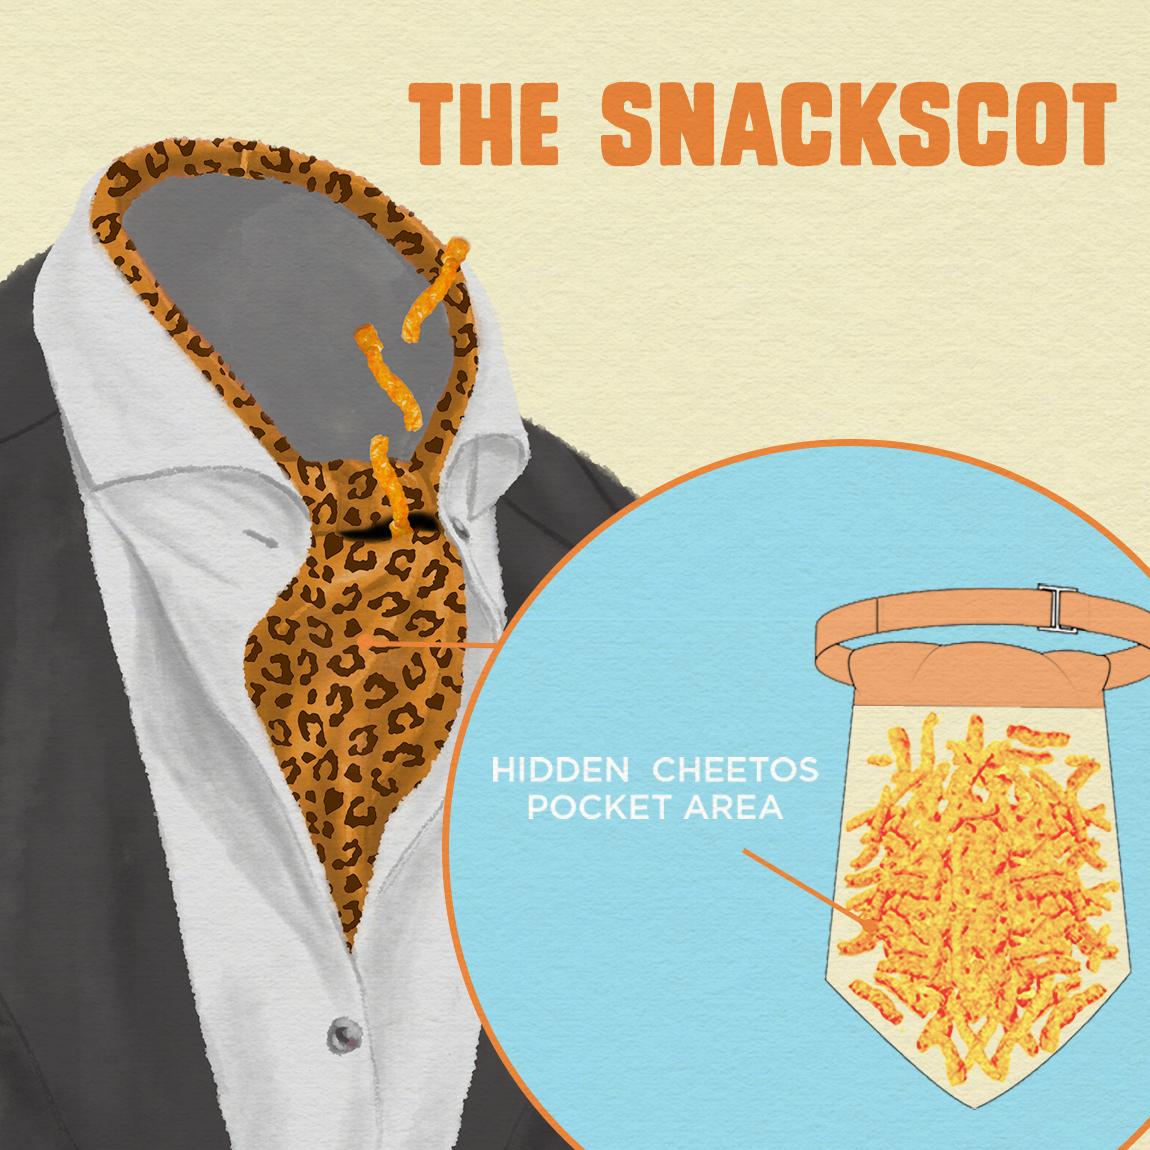 58cc837c6c2aeCheetos-The-Snackshot-1